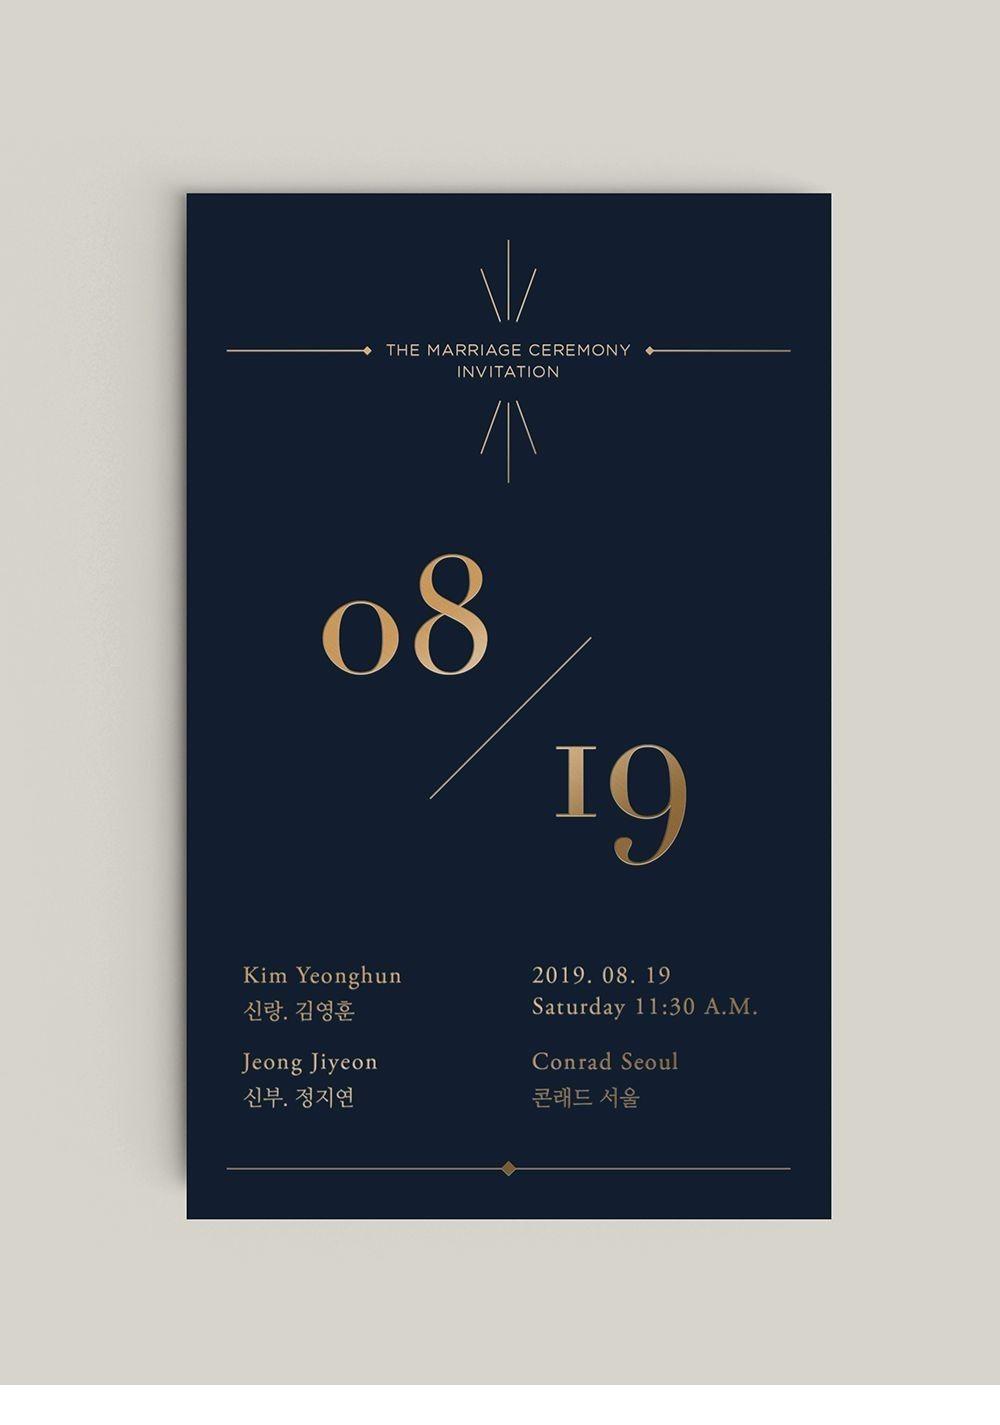 Jaimakhija I Will Design Wedding Invitation Birthday Invitation Save The Date And Rsvp Card For 15 On Fiverr Com Digital Wedding Invitations Wedding Invitation Design Minimalist Wedding Invitations